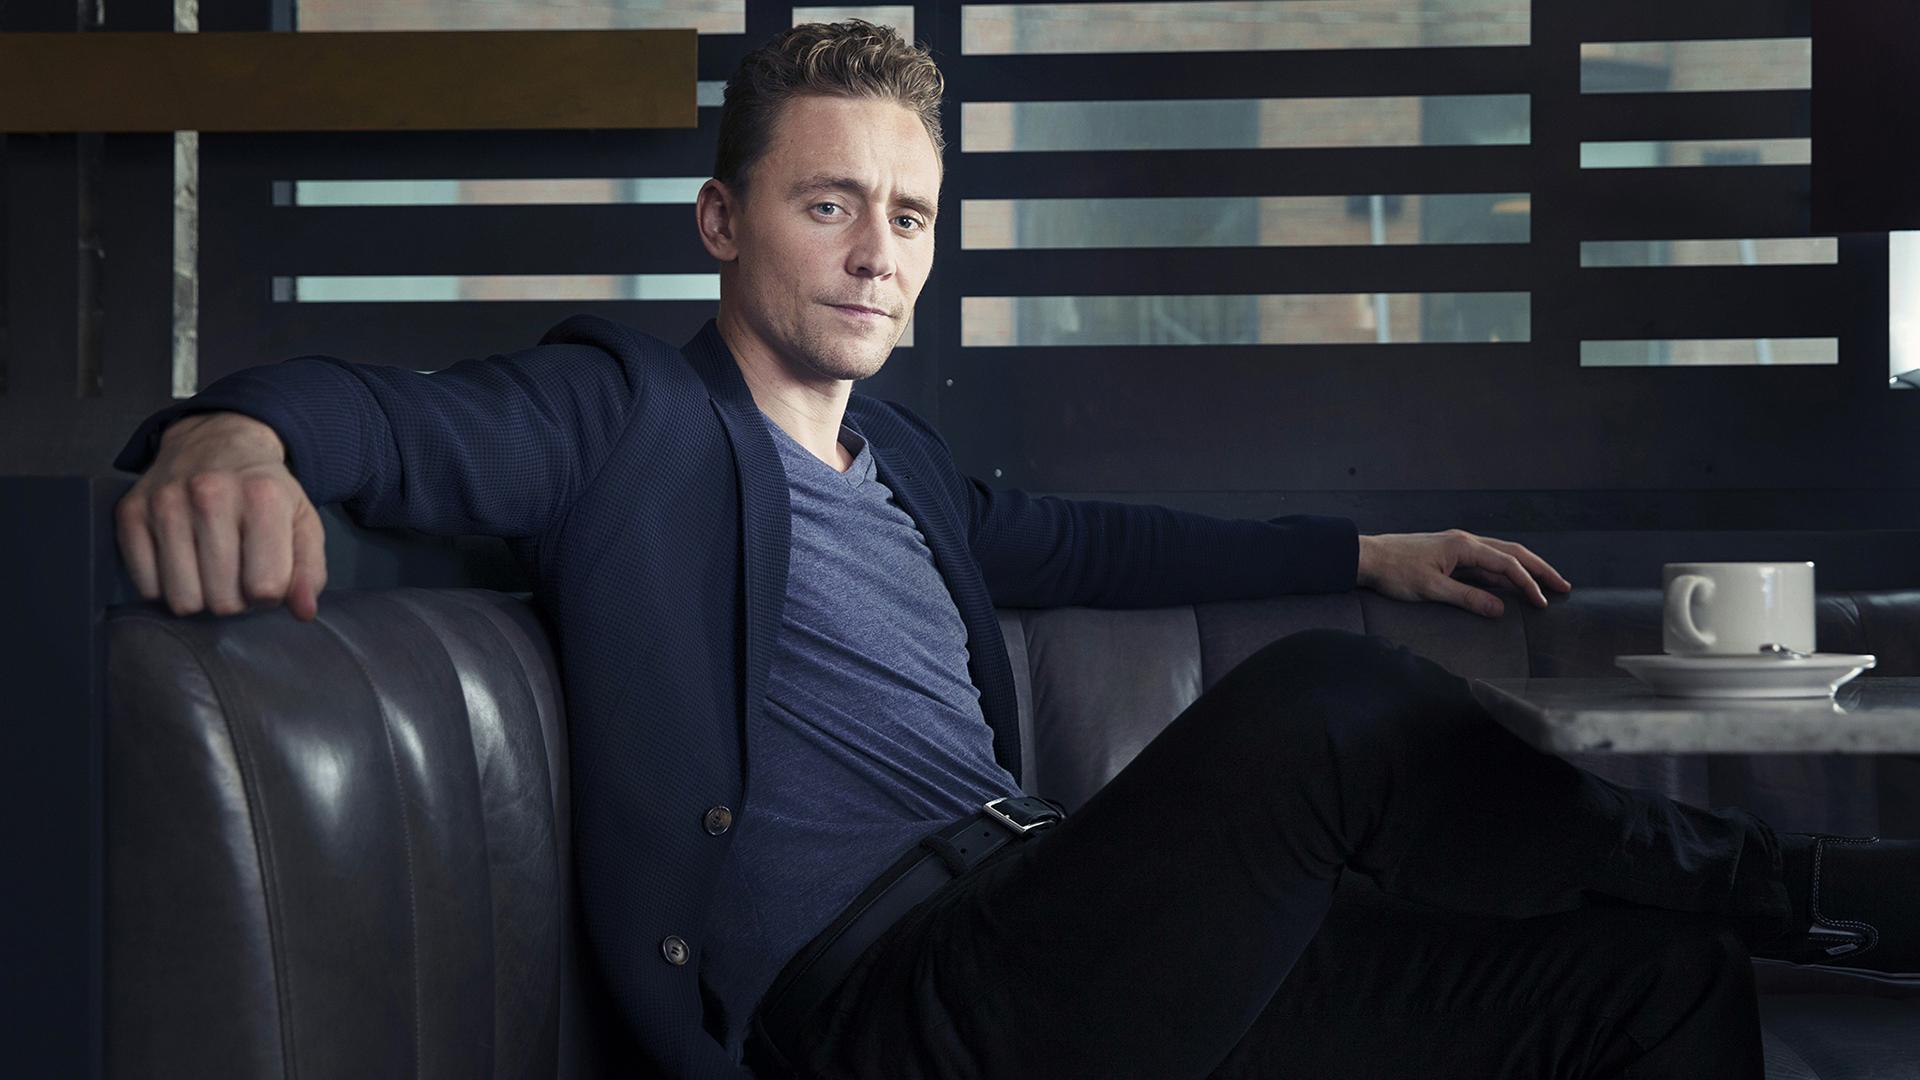 tom hiddleston archives